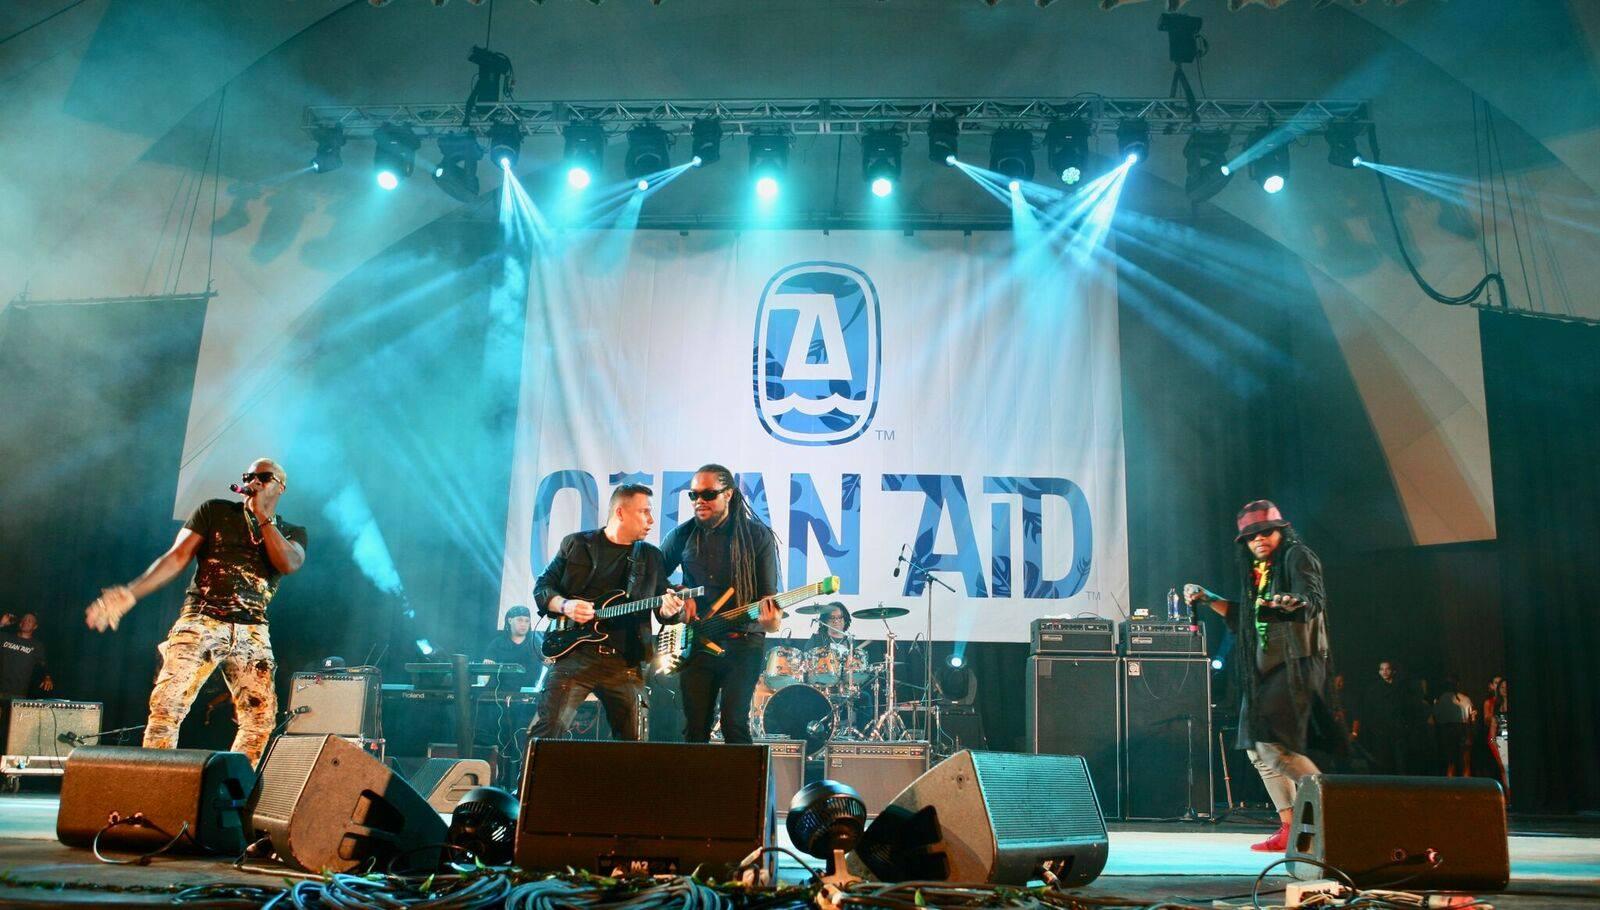 Maxi Priest live at OceanAid Music Festival 2017 - Waikiki Shell